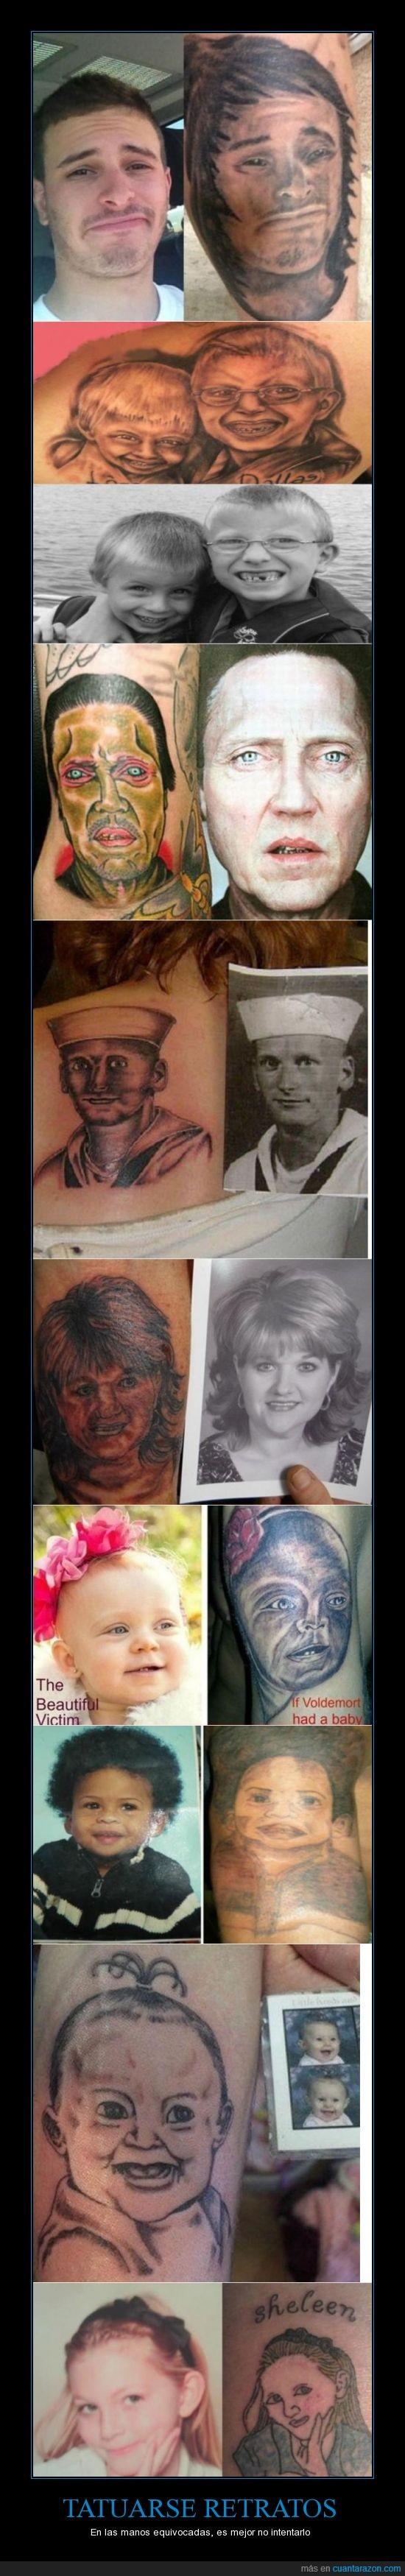 aberraciones,foto,niña,retrato,tattoo,tatuaje